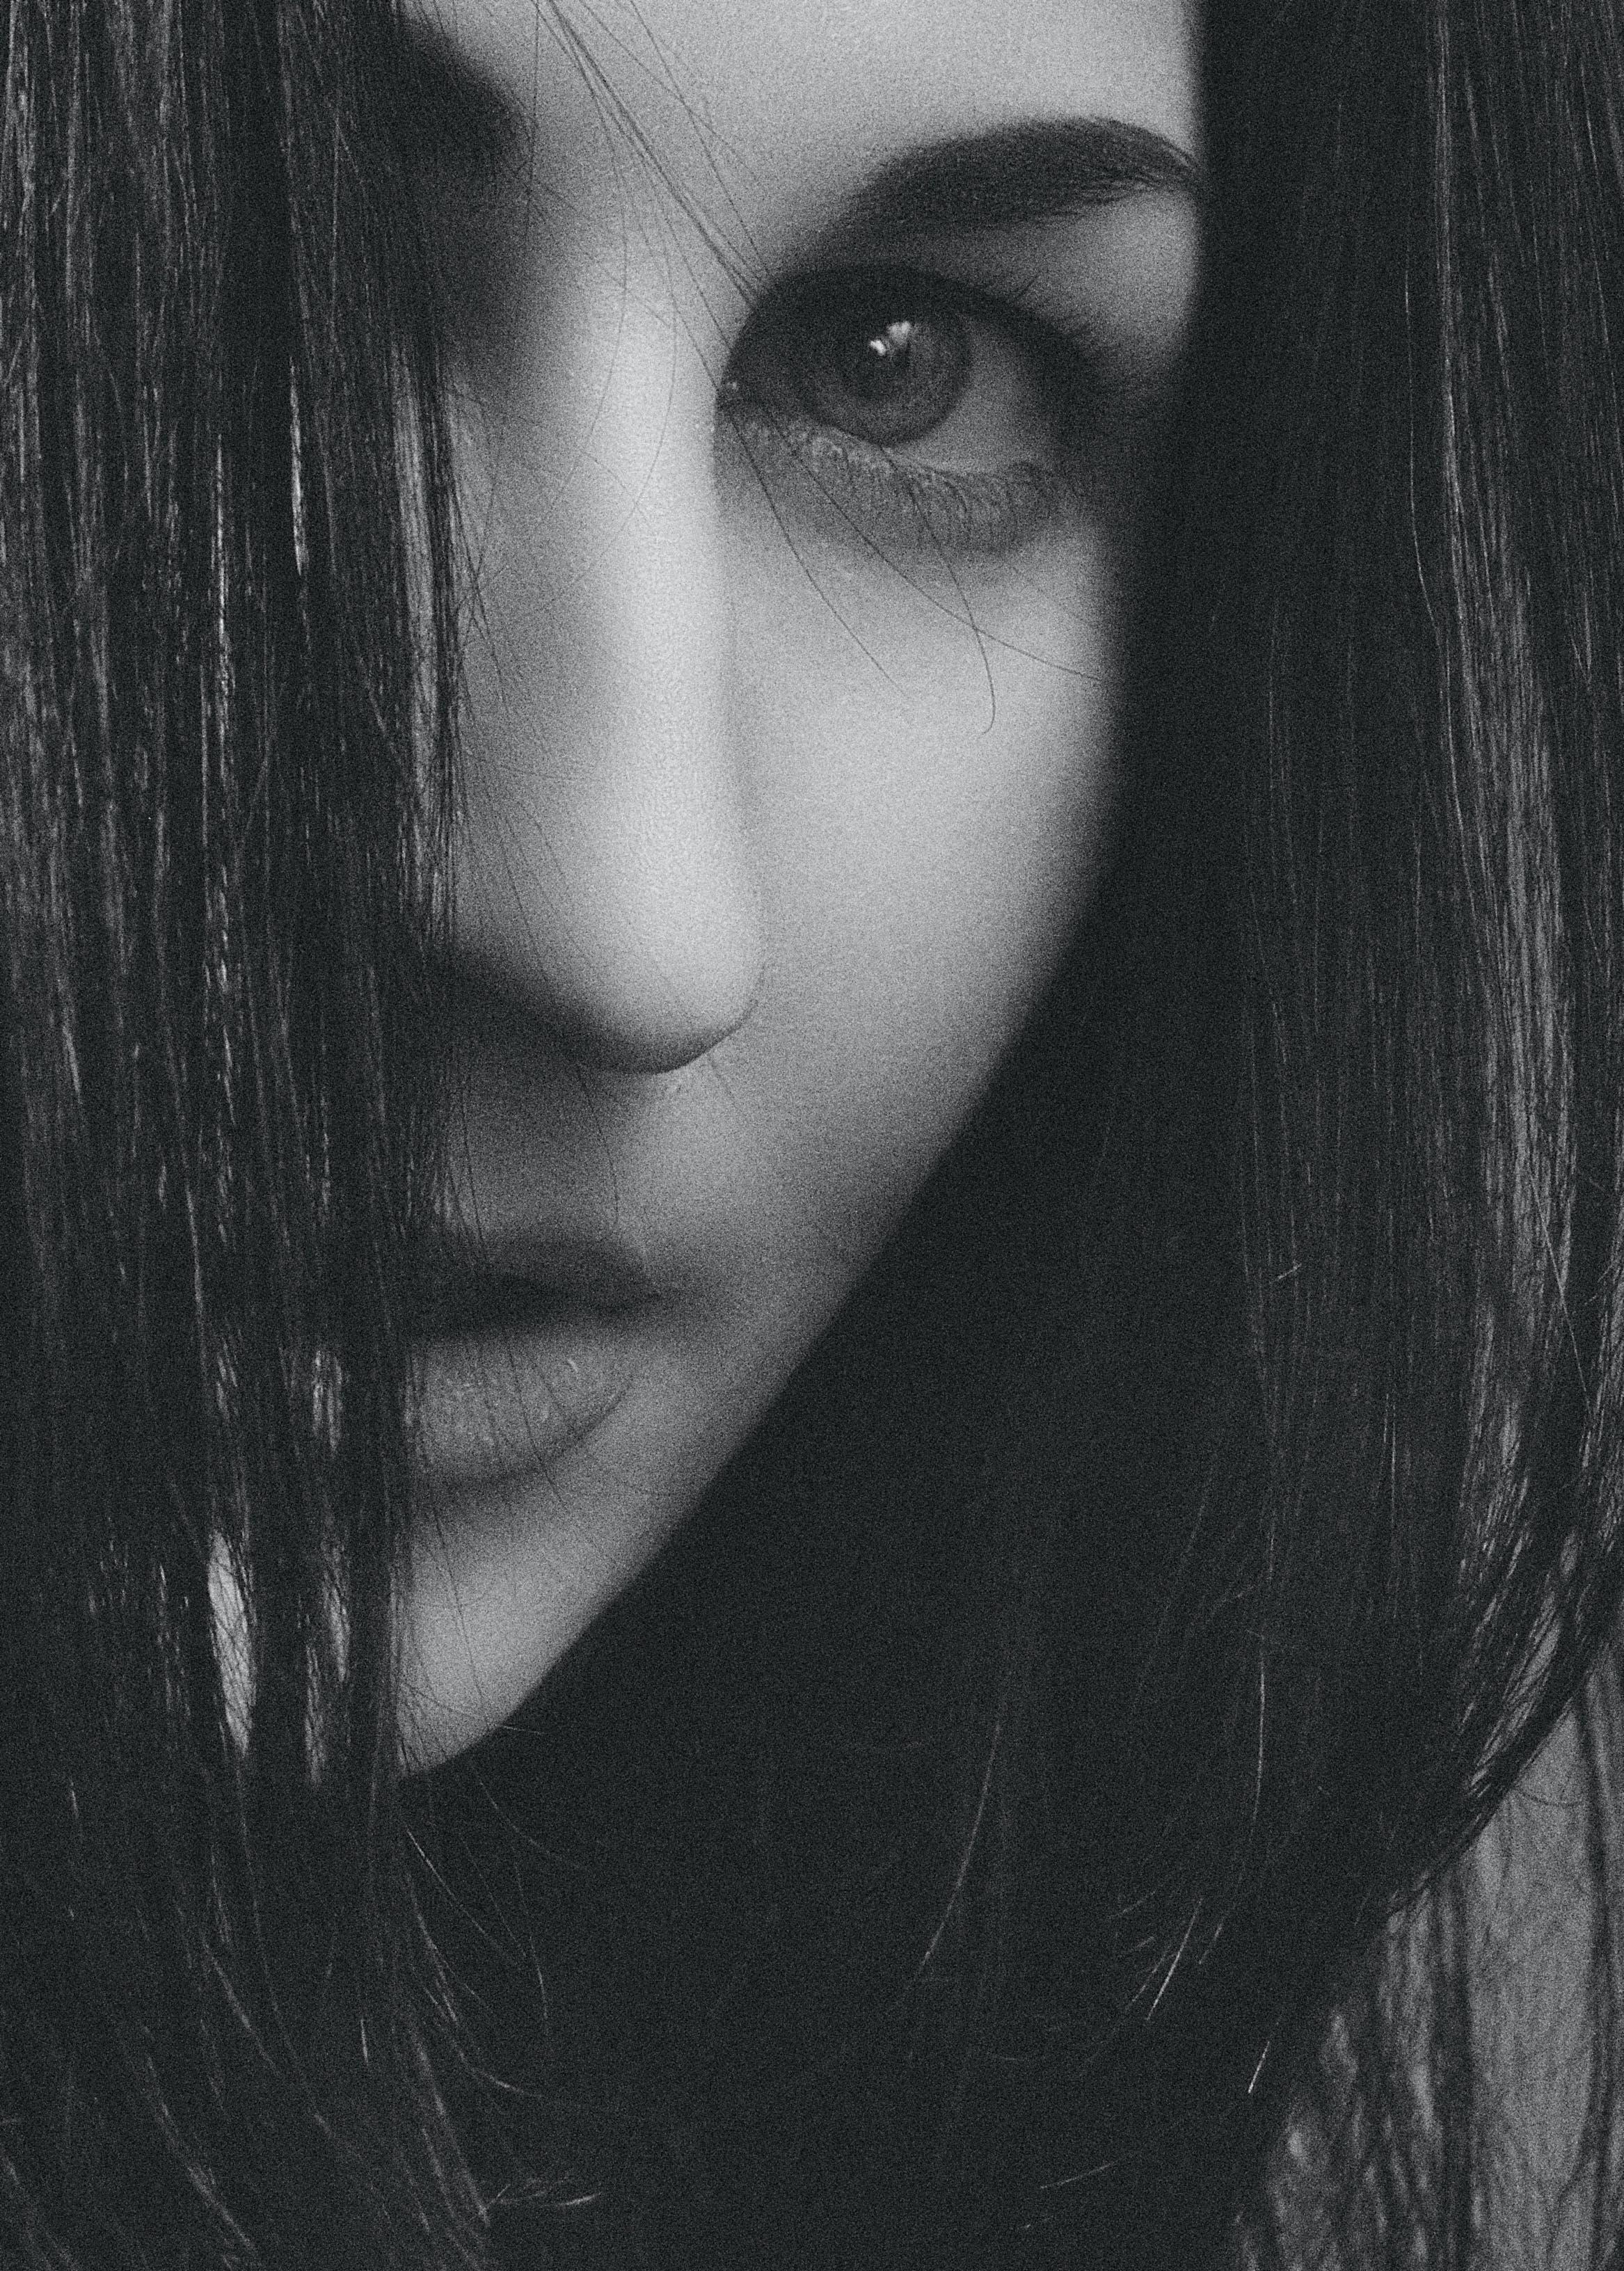 Kostenloses Stock Foto zu девушка, портрет, студийный, улыбка